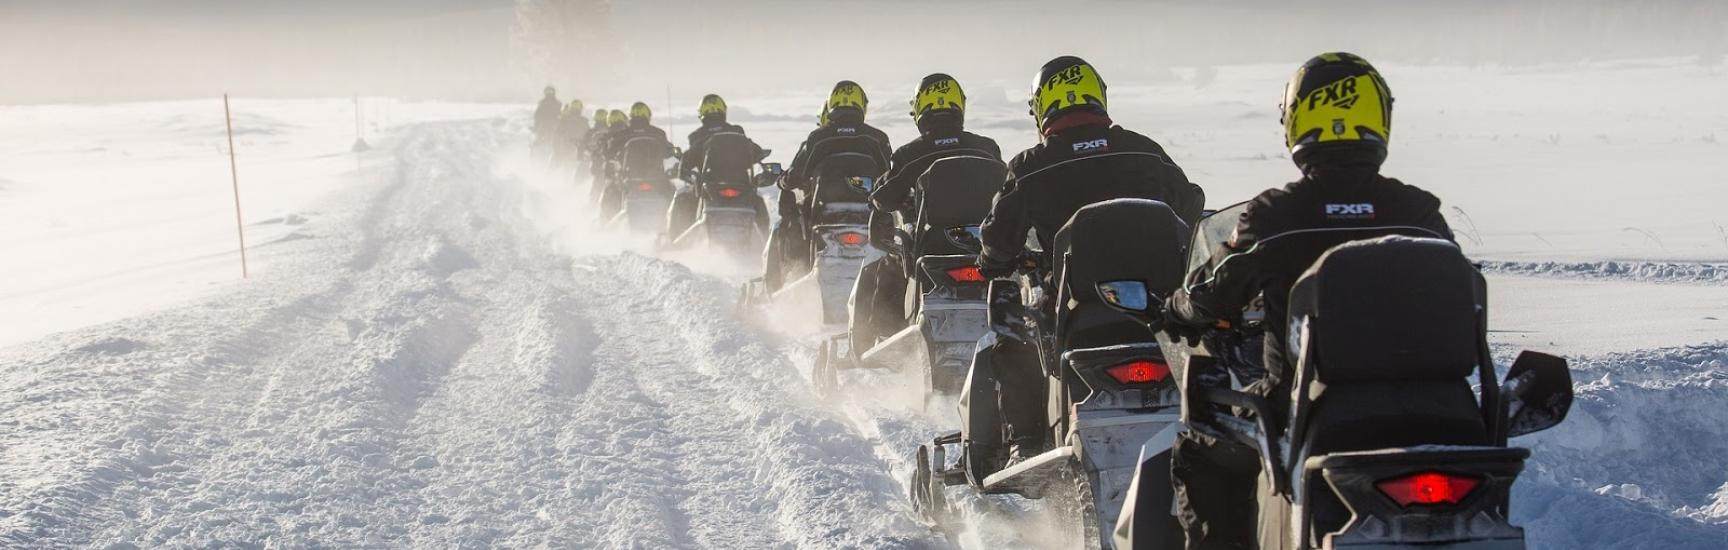 men riding snowmobiles